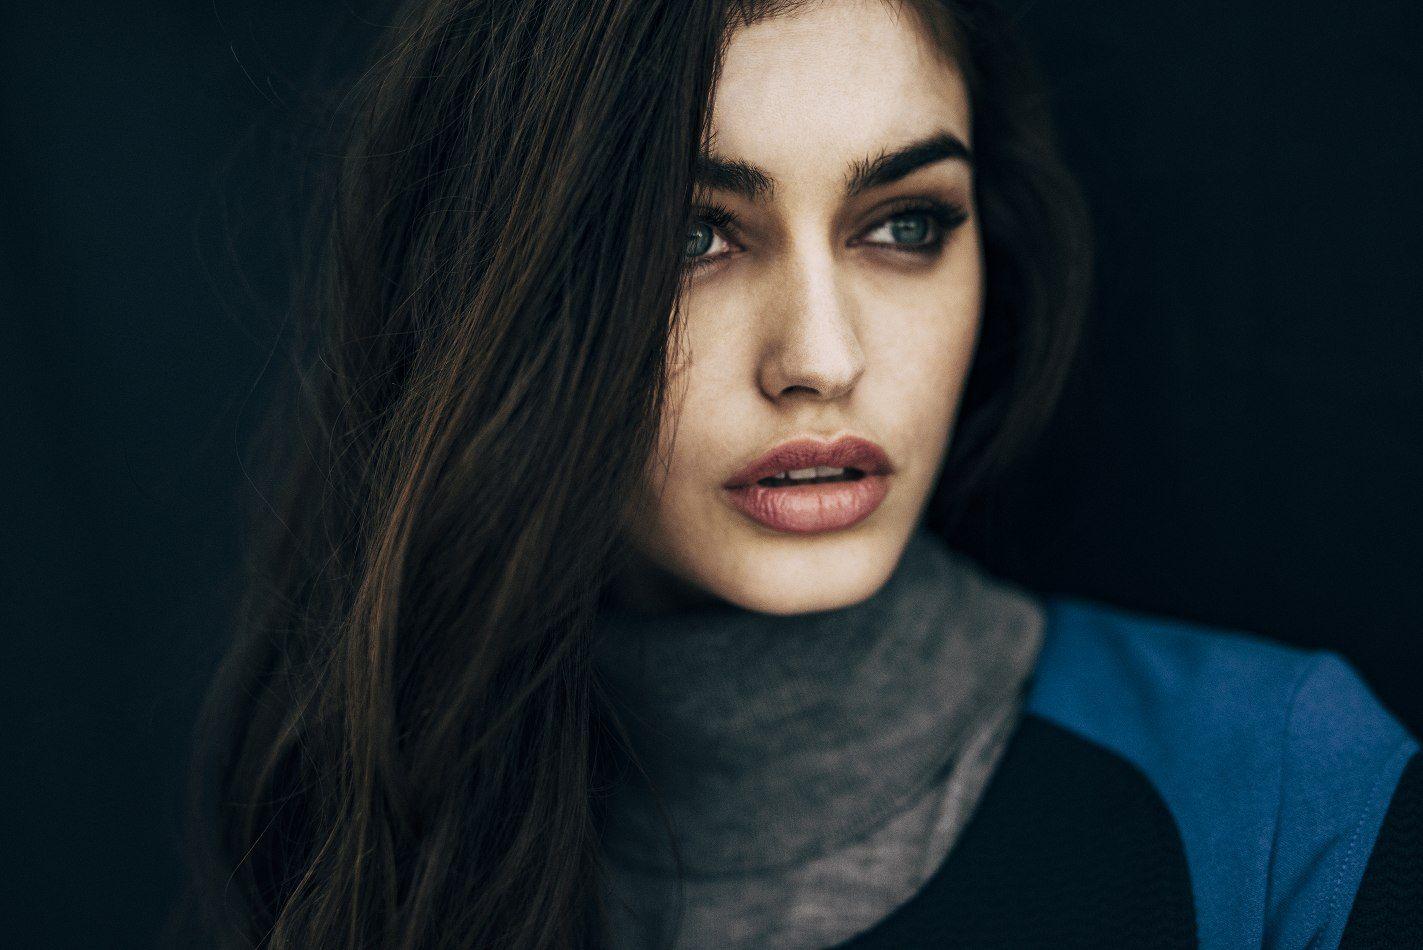 Sara Tansy